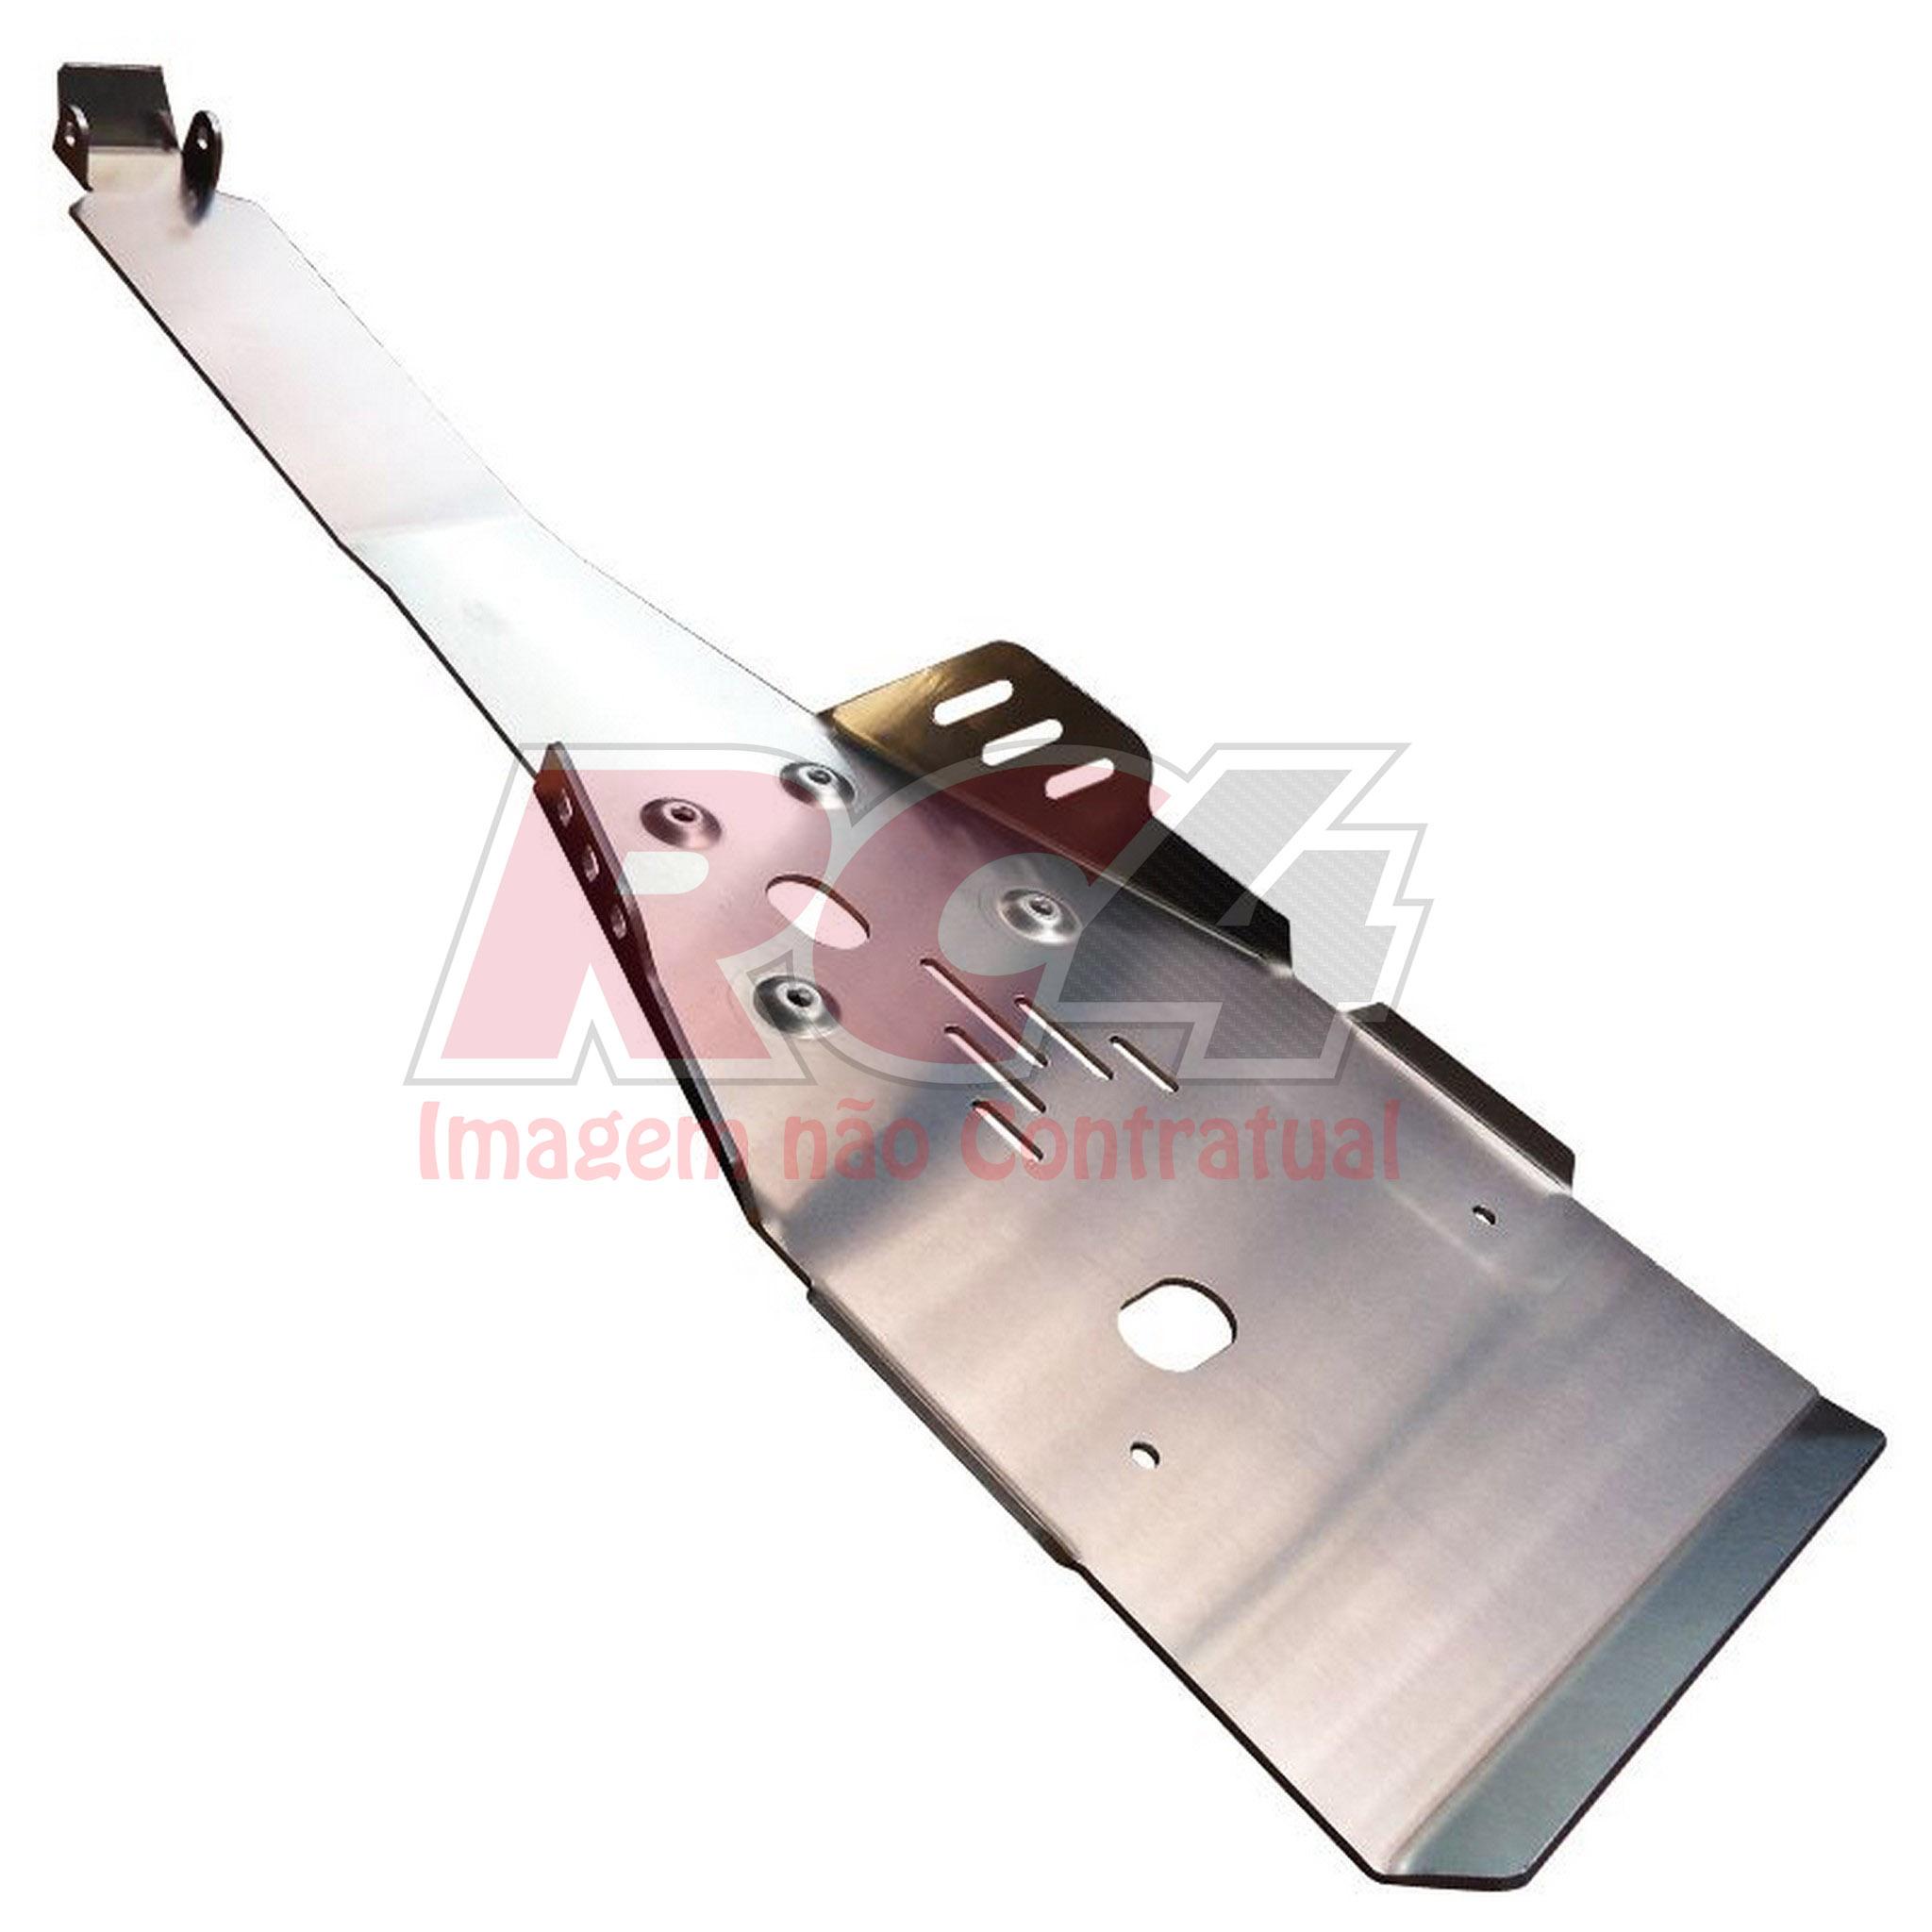 Proteção Chassi XRW Alumínio